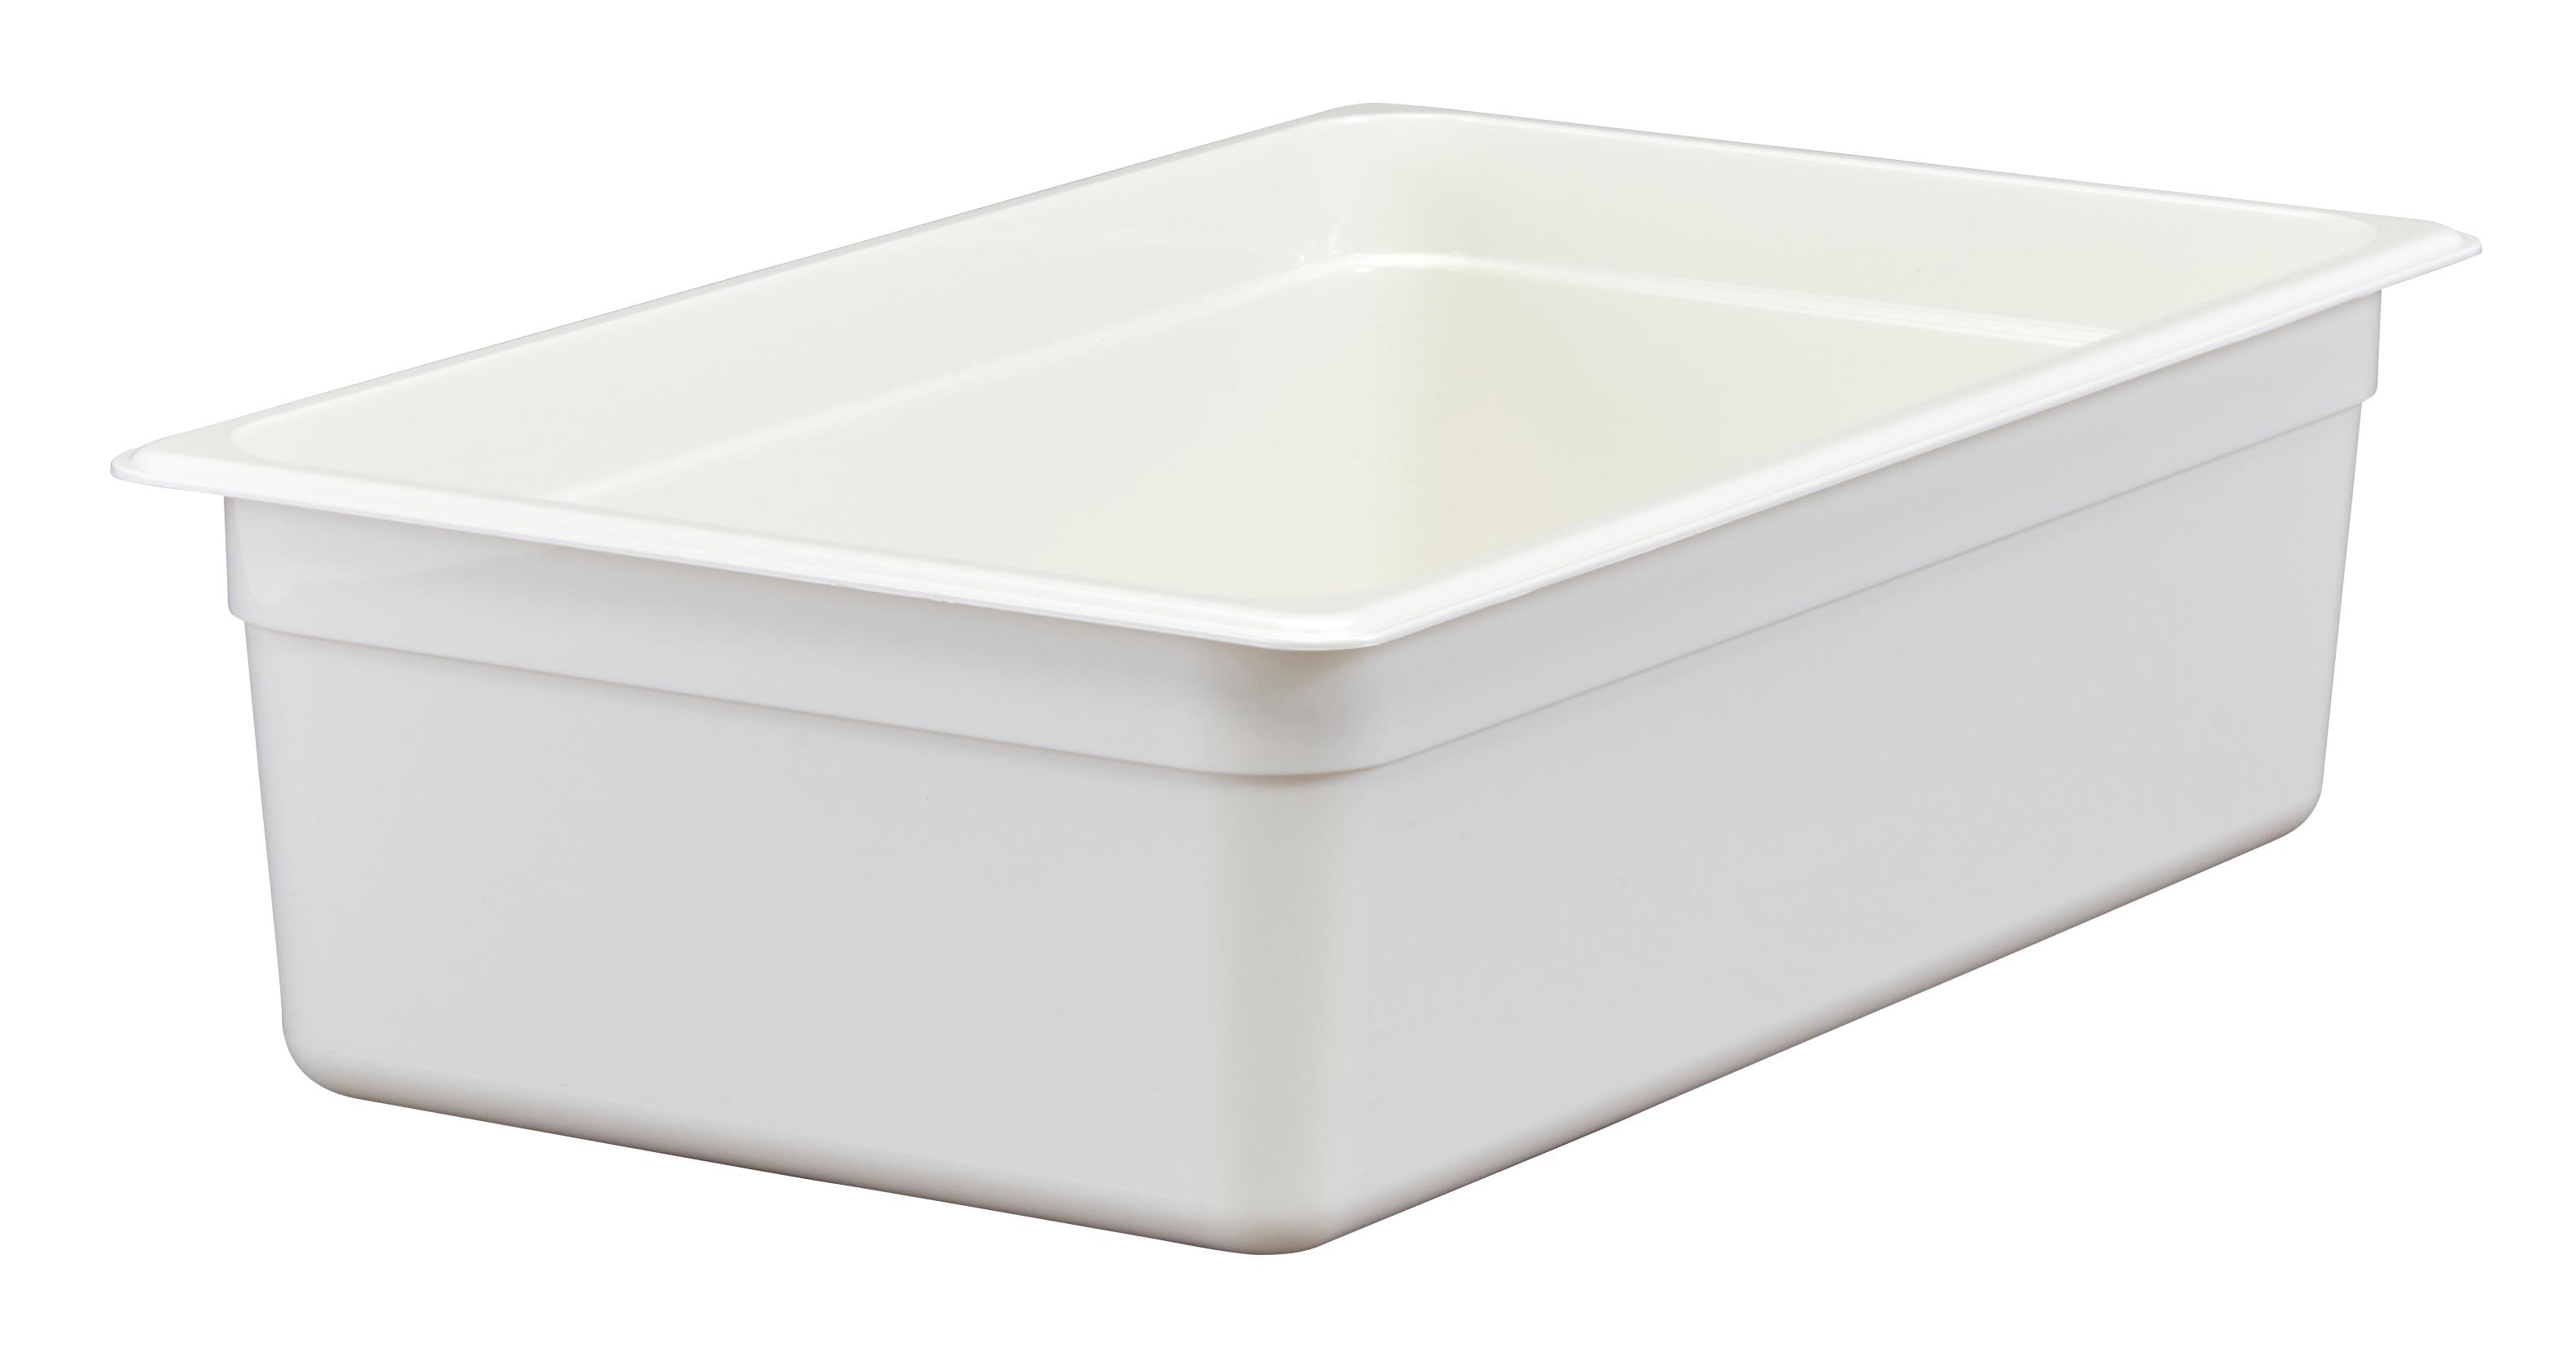 Cambro 16CW148 food/beverage storage container